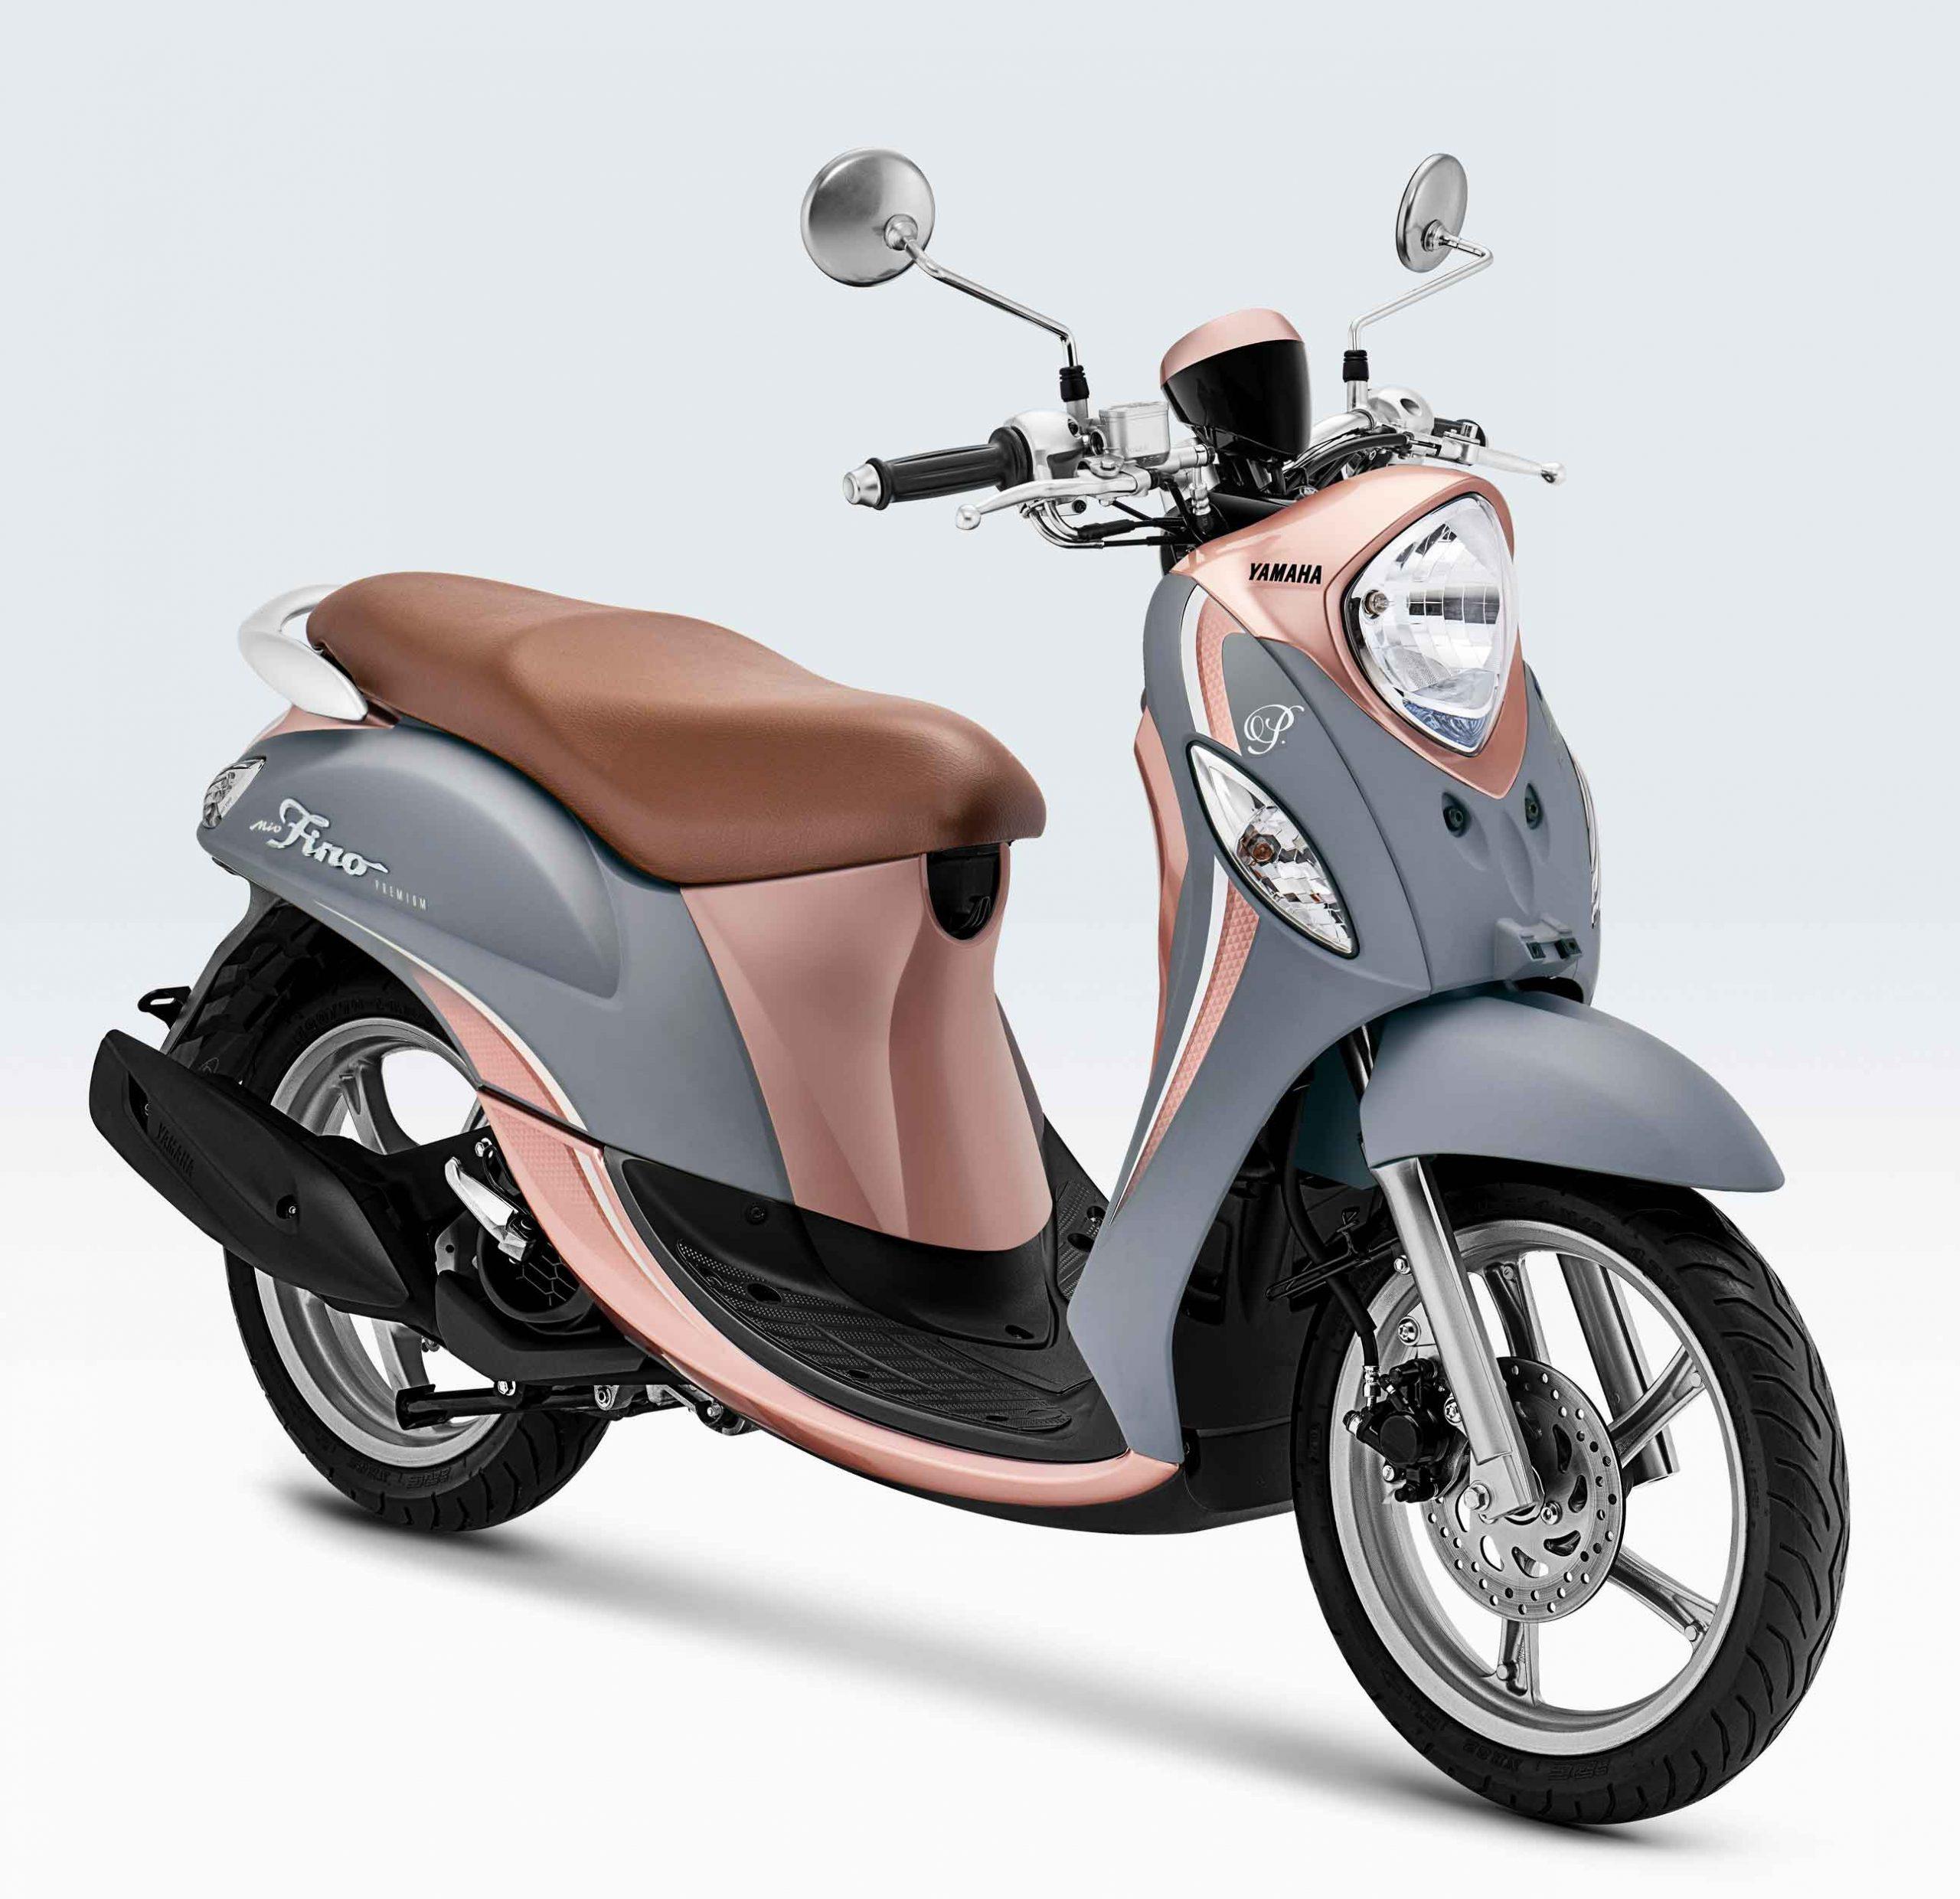 3 Pilihan warna baru Yamaha Fino Premium tahun 2020-2021 (1)